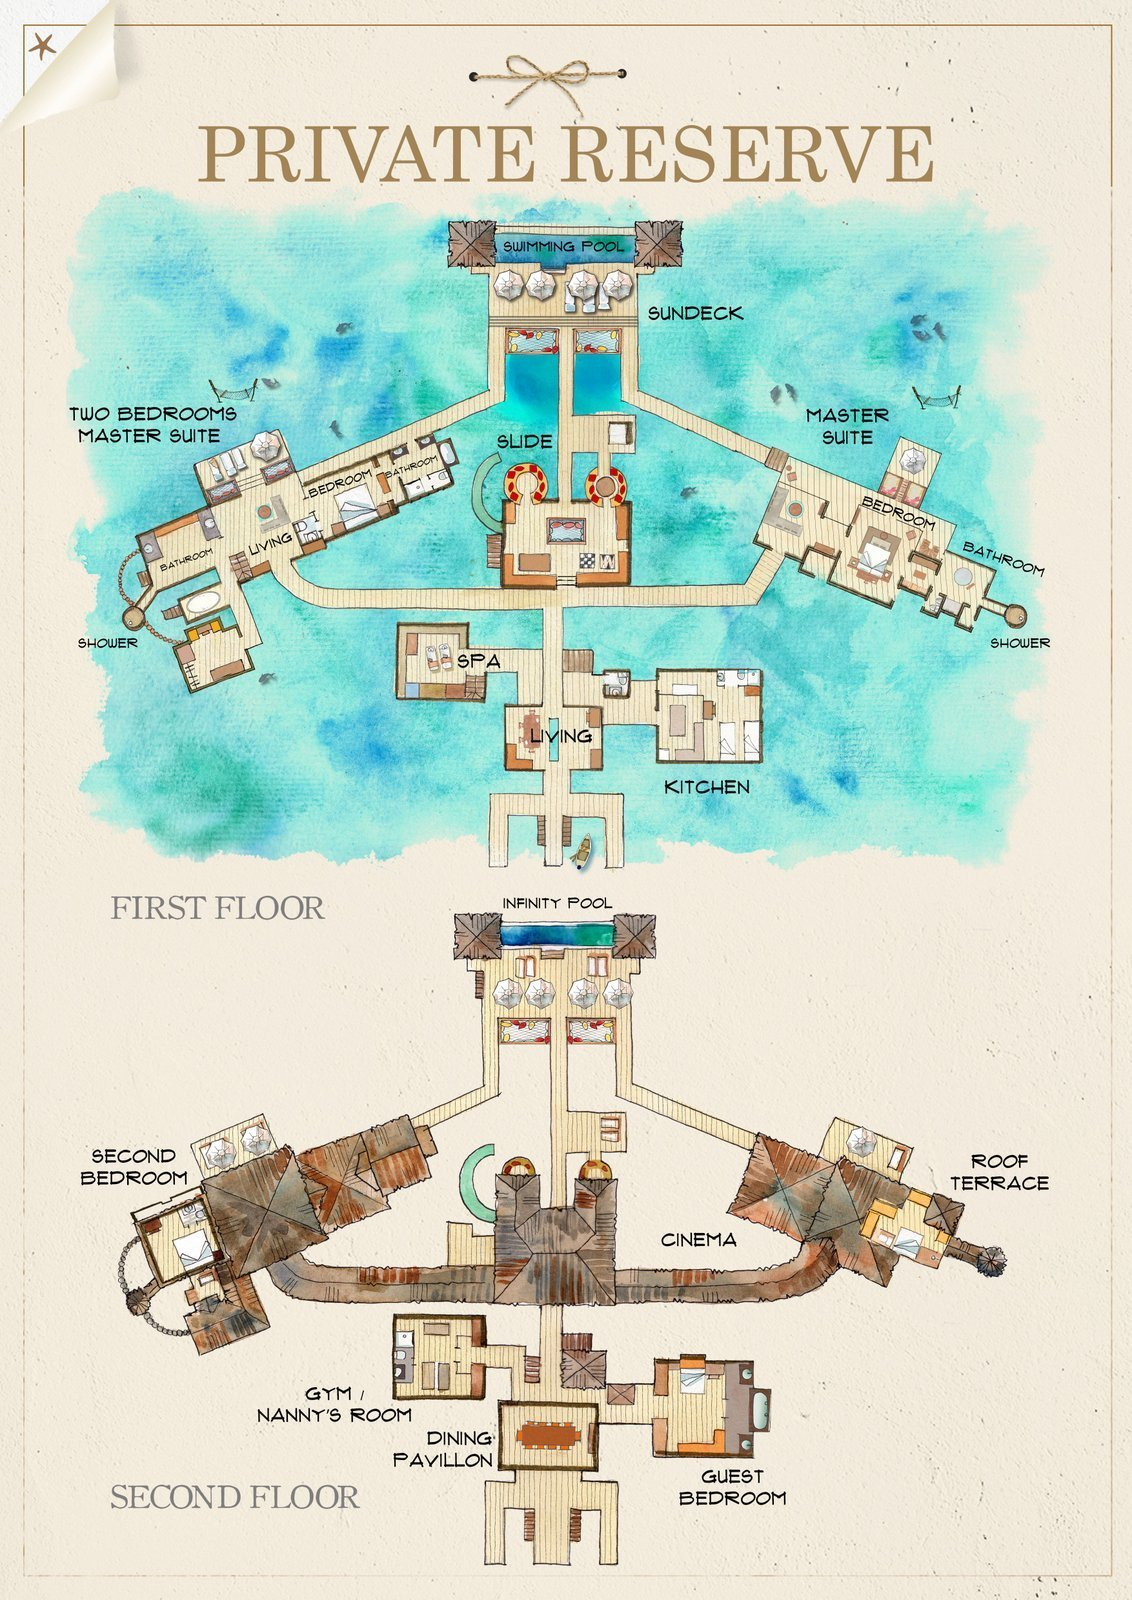 Мальдивы, отель Gili Lankanfushi Maldives, план-схема номера The Private Reserve